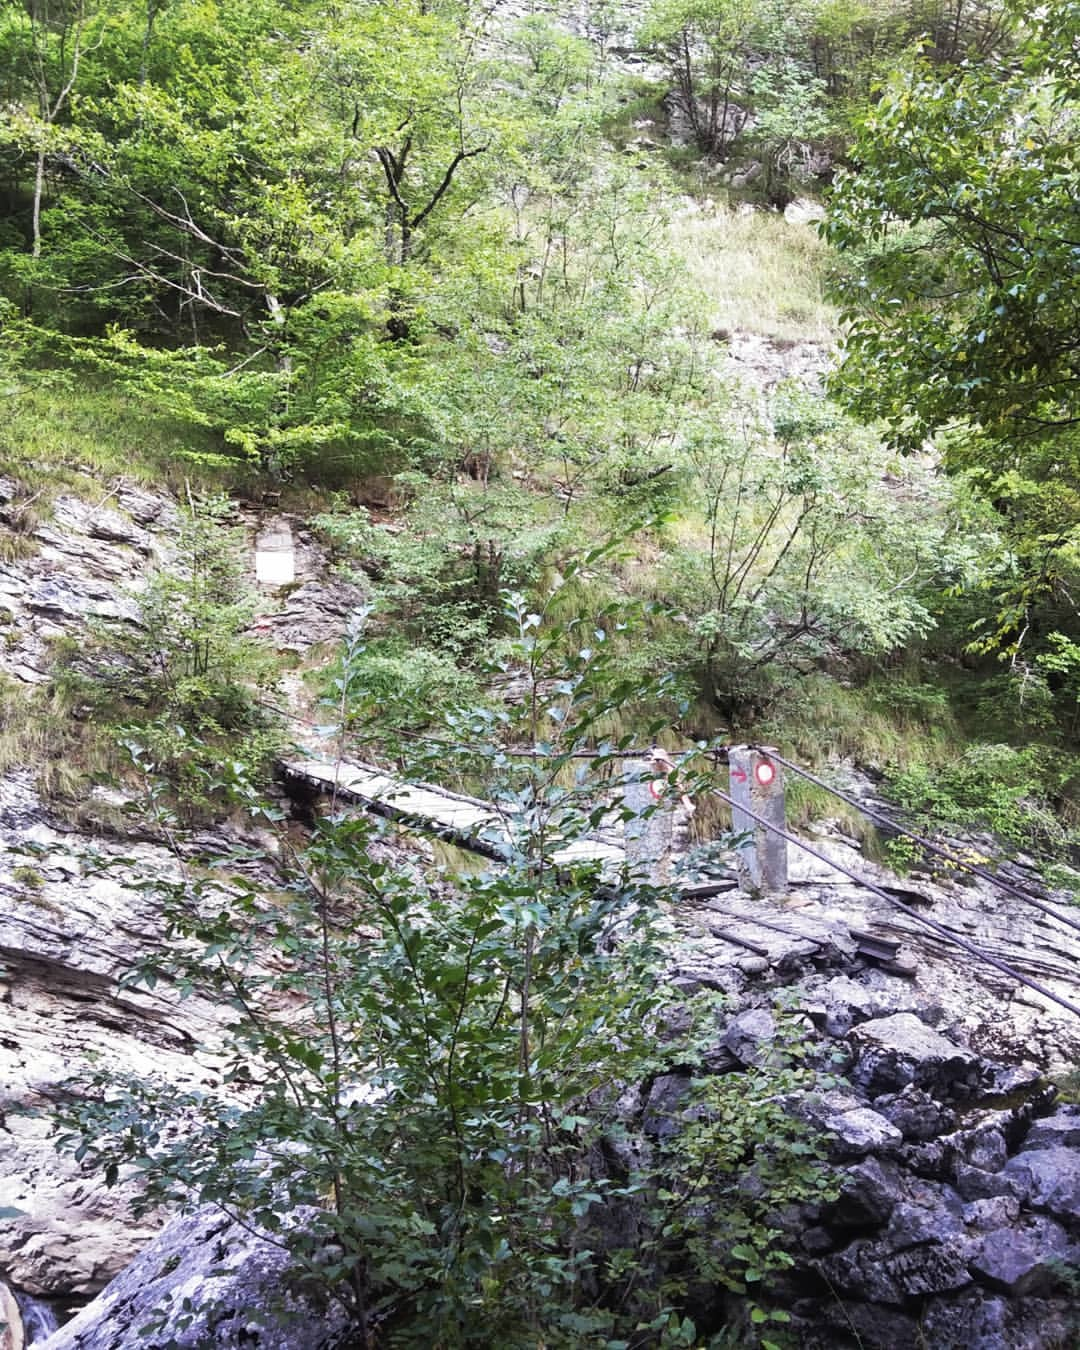 Some extraordinary hiking scenery in Bosnia 在波斯尼亚的一些非凡的远足风景